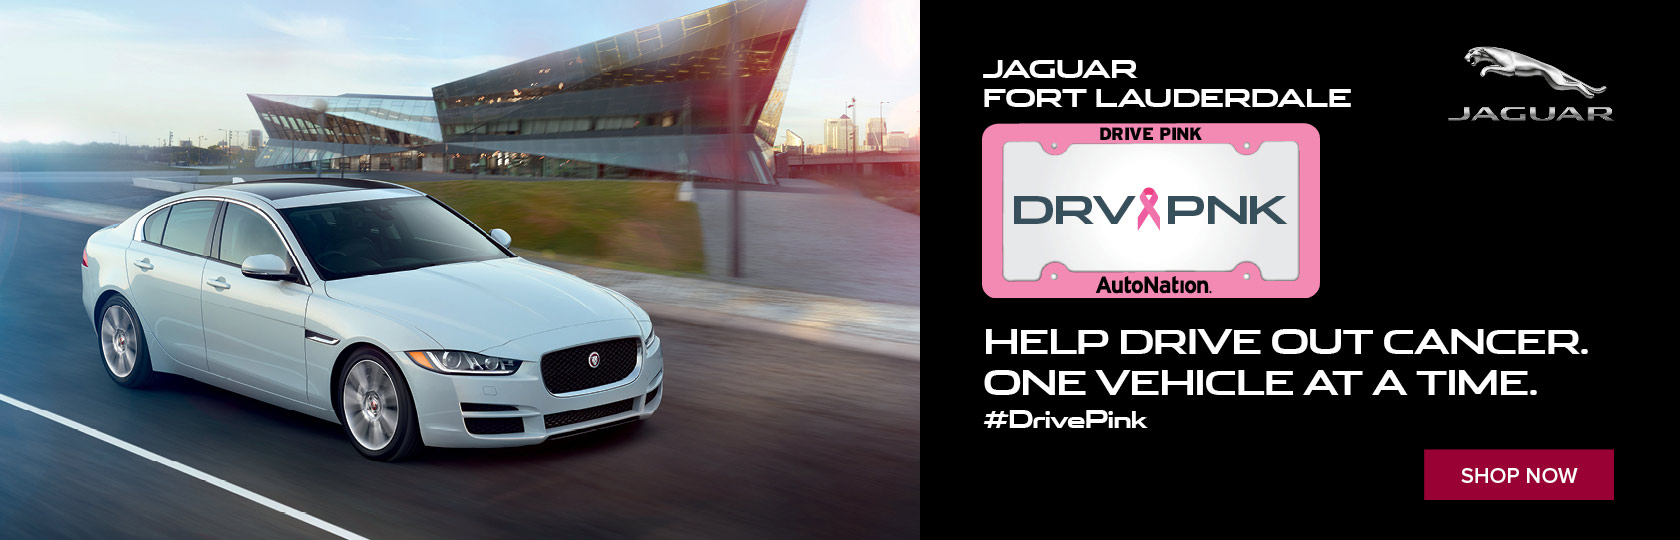 classic jaguar fort lauderdale for near car convertible cars import xjs sale